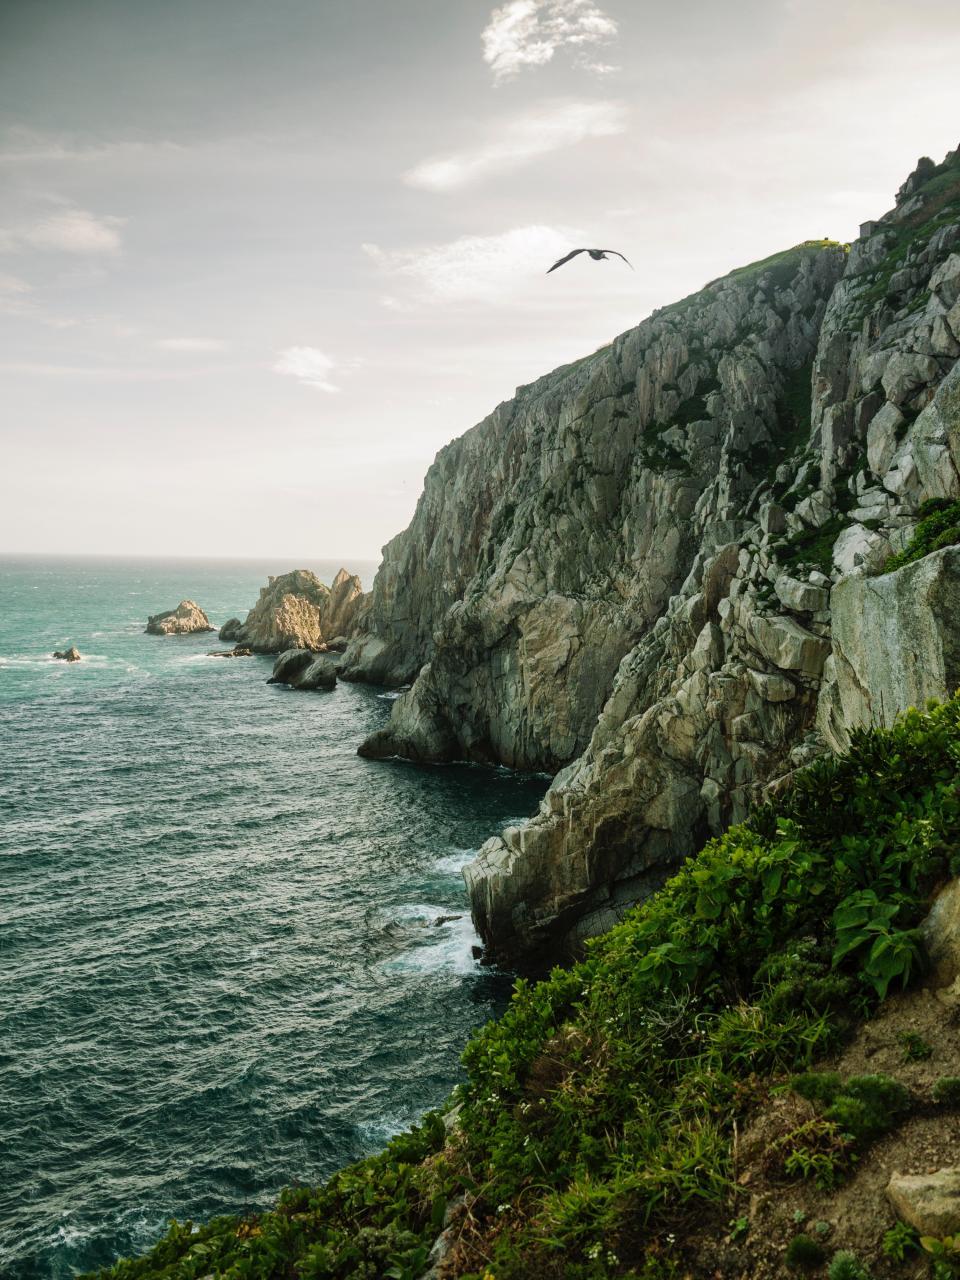 sea, ocean, water, wave, nature, coast, rock, green, grass, hill, mountain, landscape, cliff, cloud, sky, bird, flying, animal